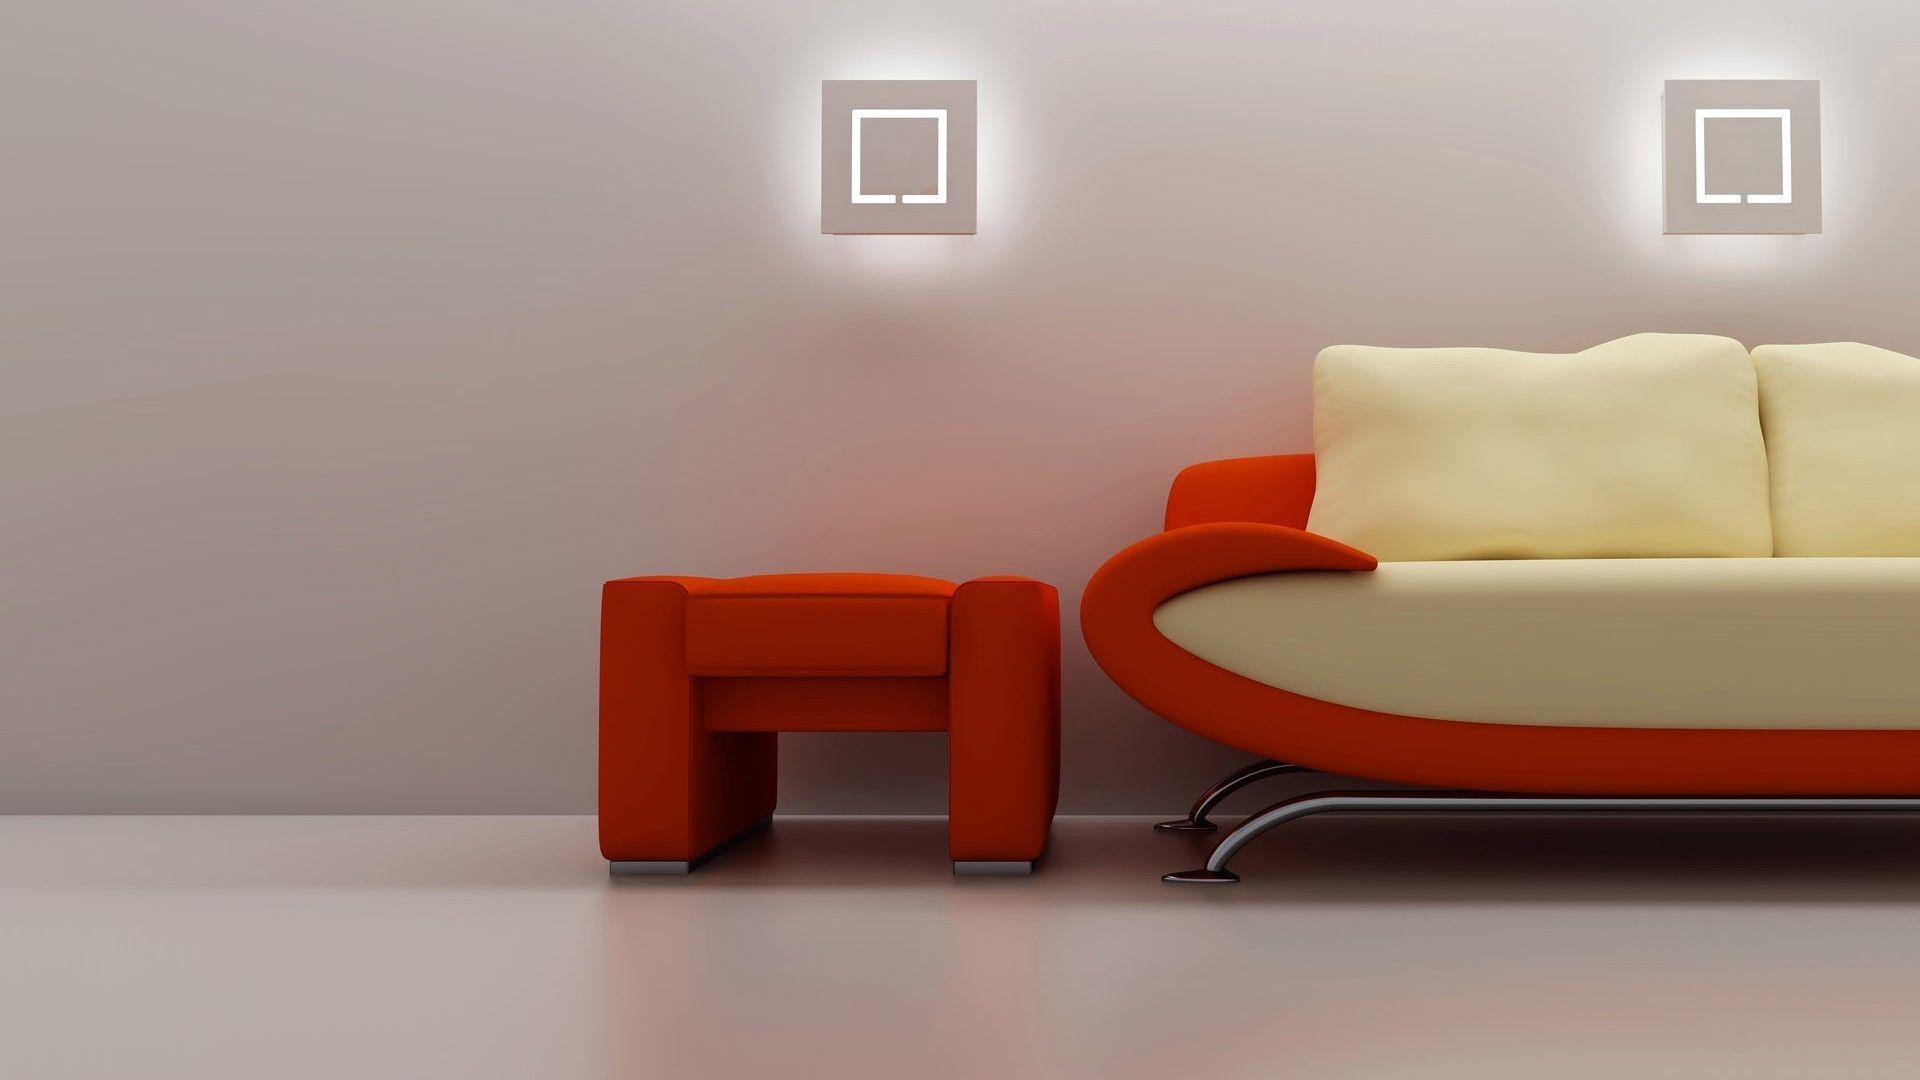 Furniture wallpaper image hd